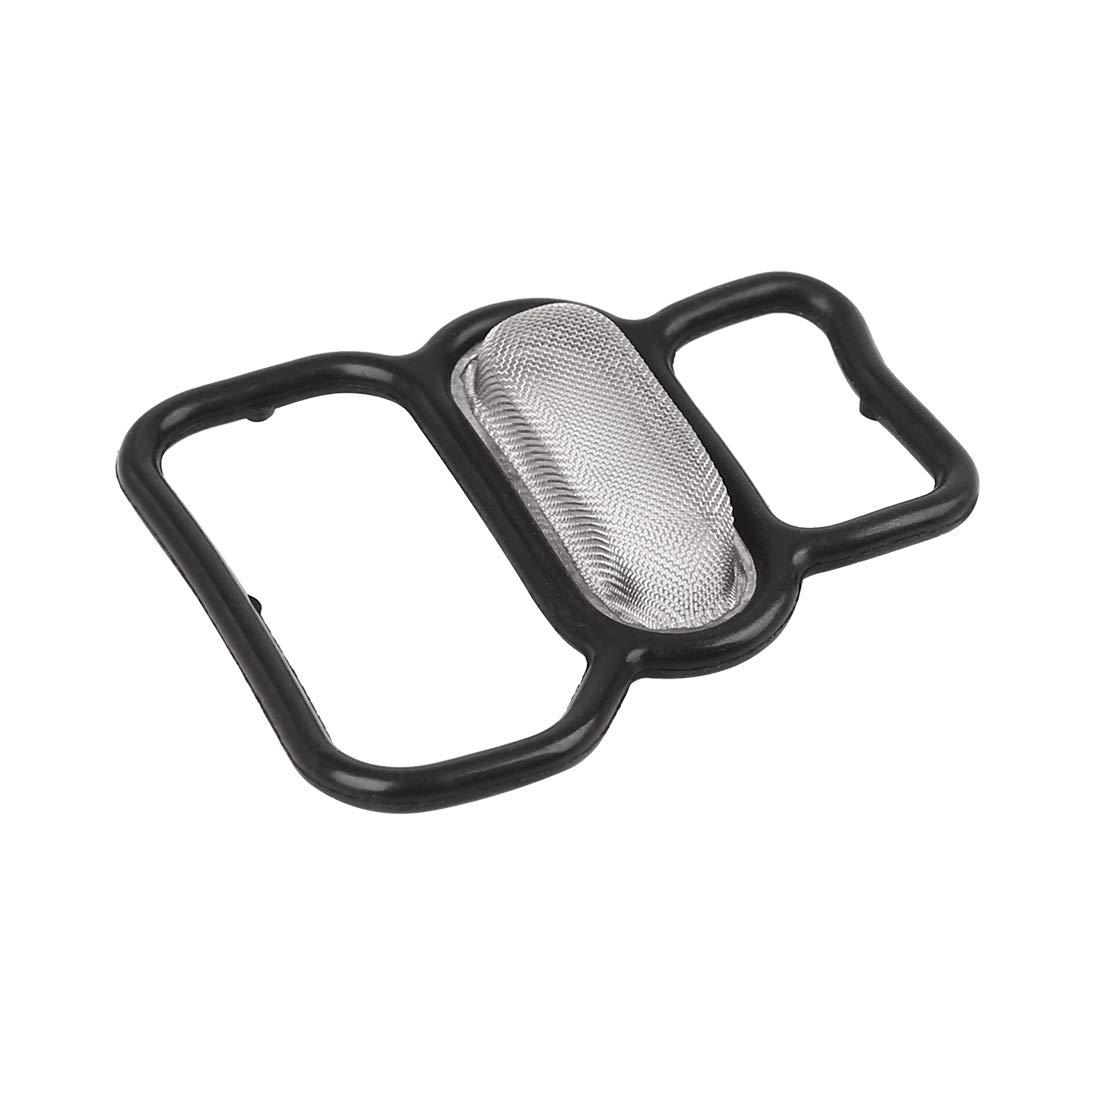 X AUTOHAUX Cylinder Head Solenoid Gasket Engine Seal Valve Filter for Honda 15825-P2M-005